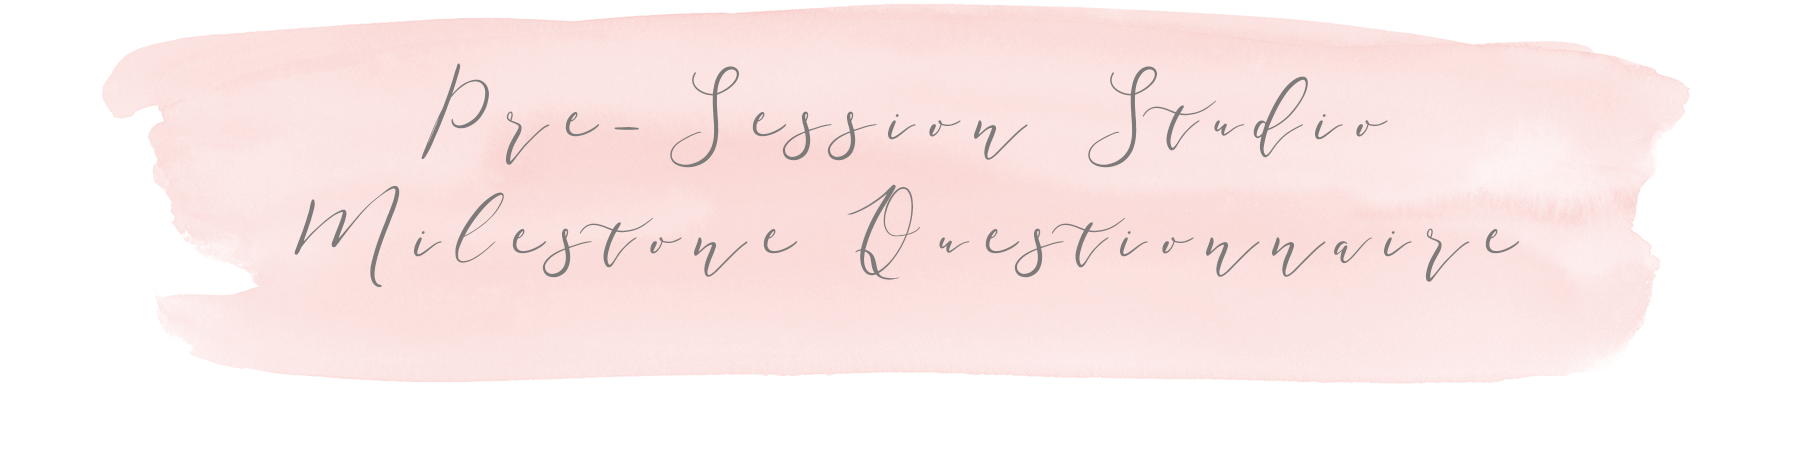 Studio Milestone Questionnaire Pic.png